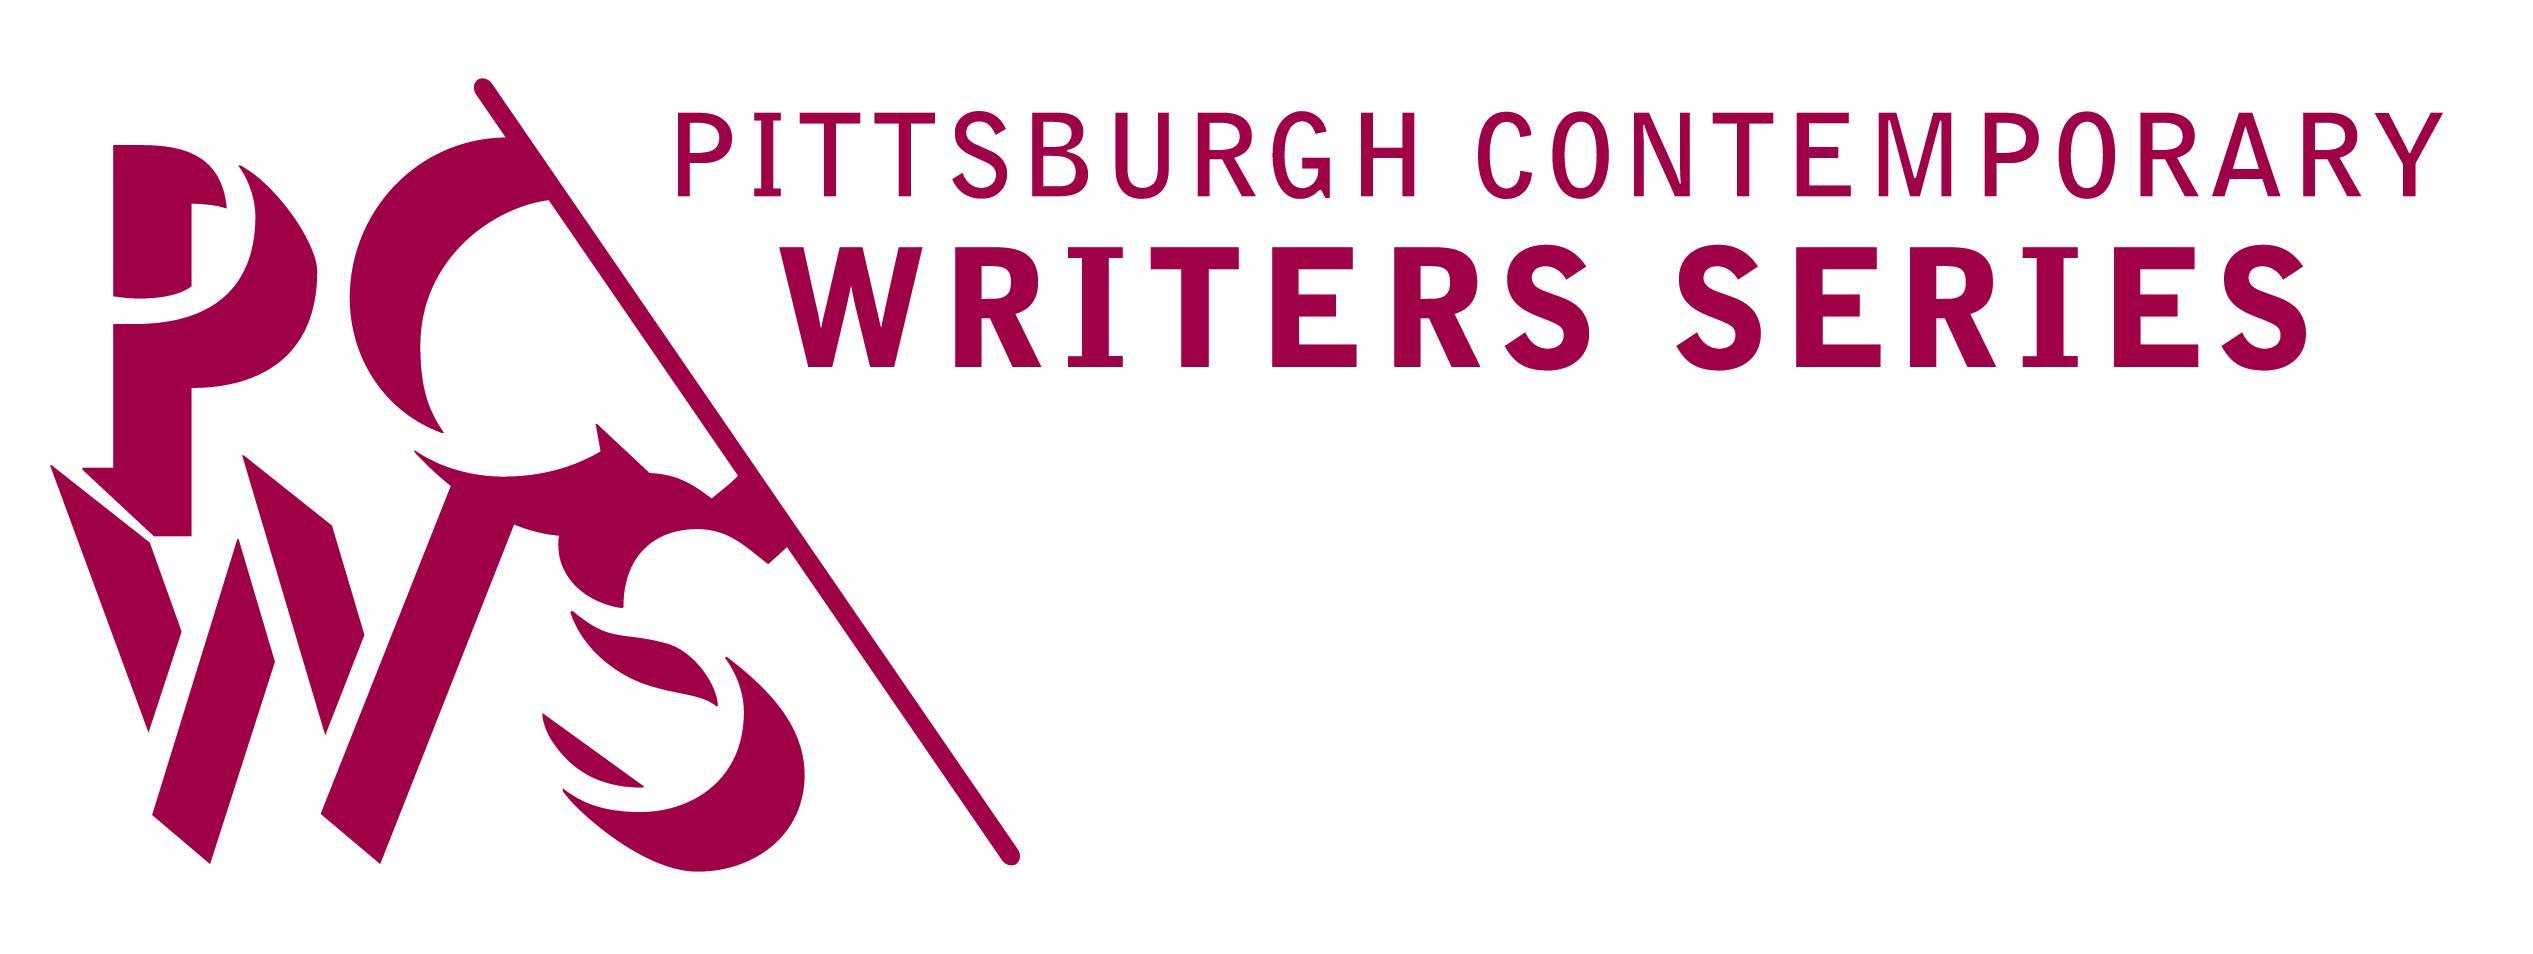 Pittsburgh Contemporary Writers' Series, Rachel Ghansah